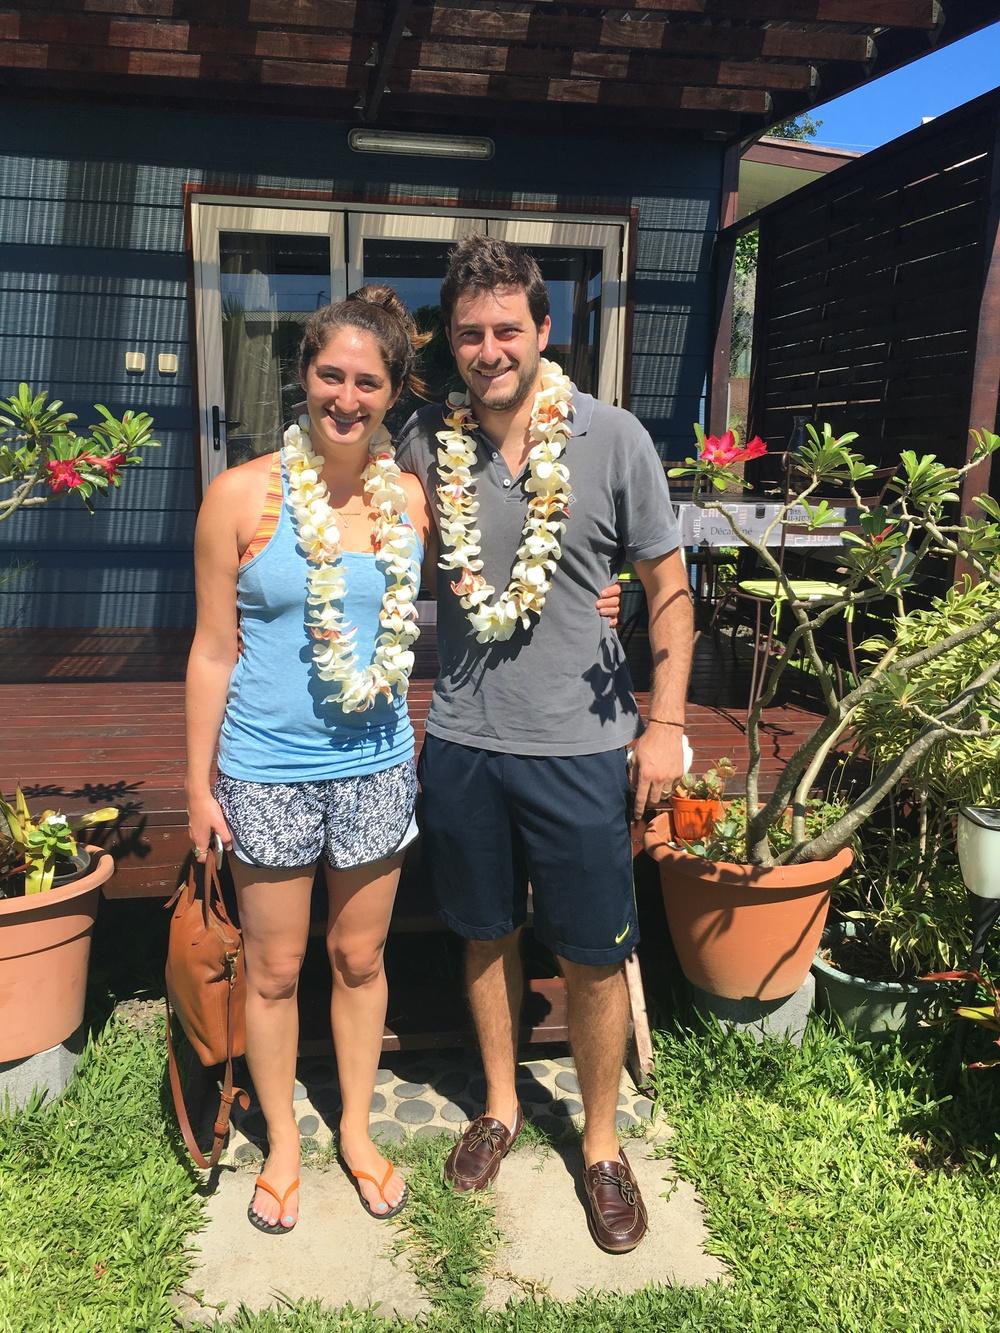 A lei welcome to Tahiti